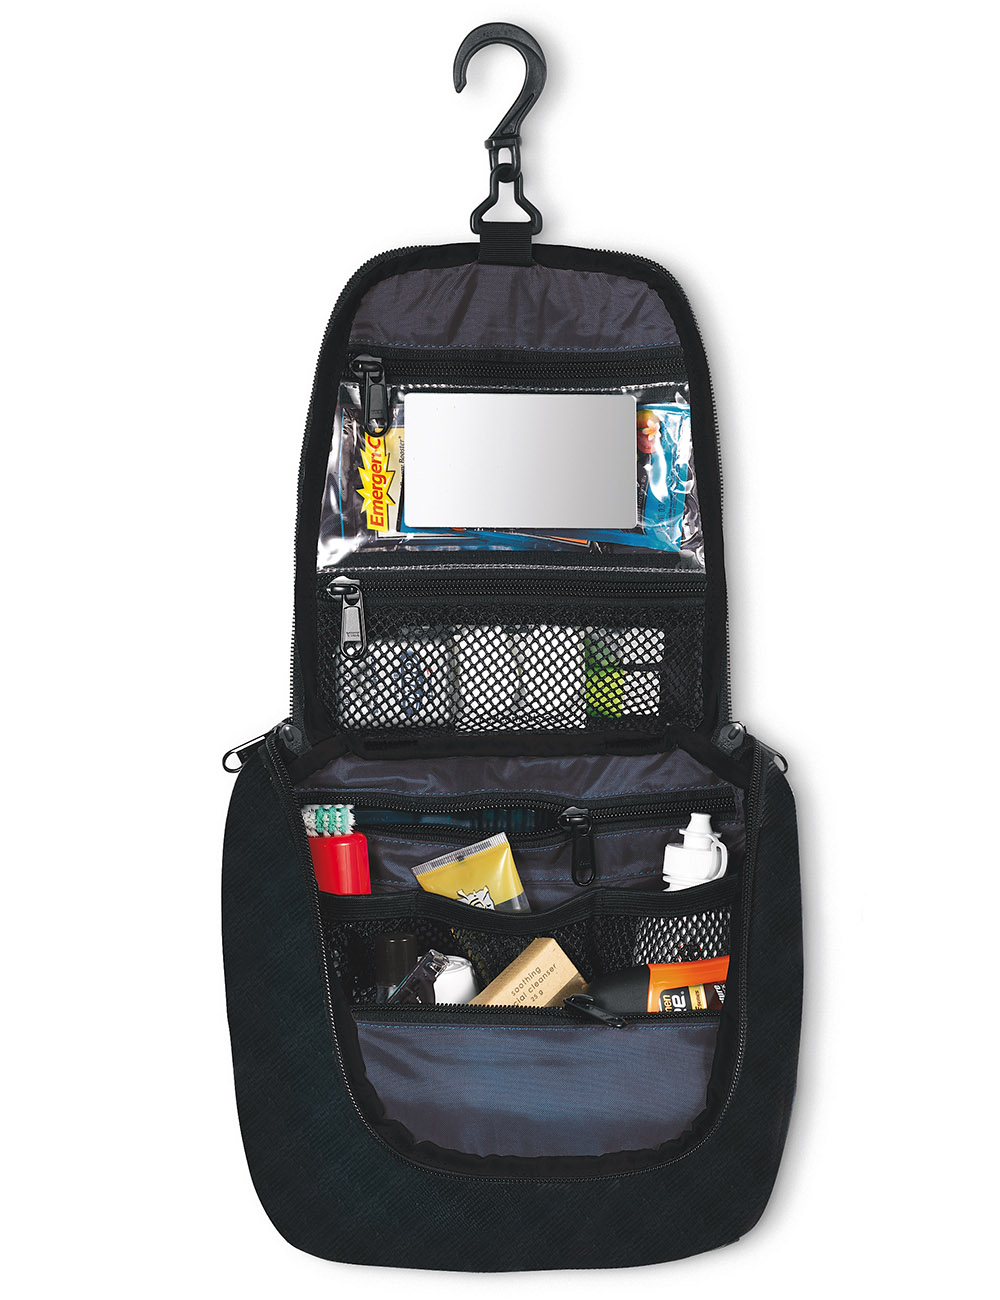 Travel Surf Bag Reviews